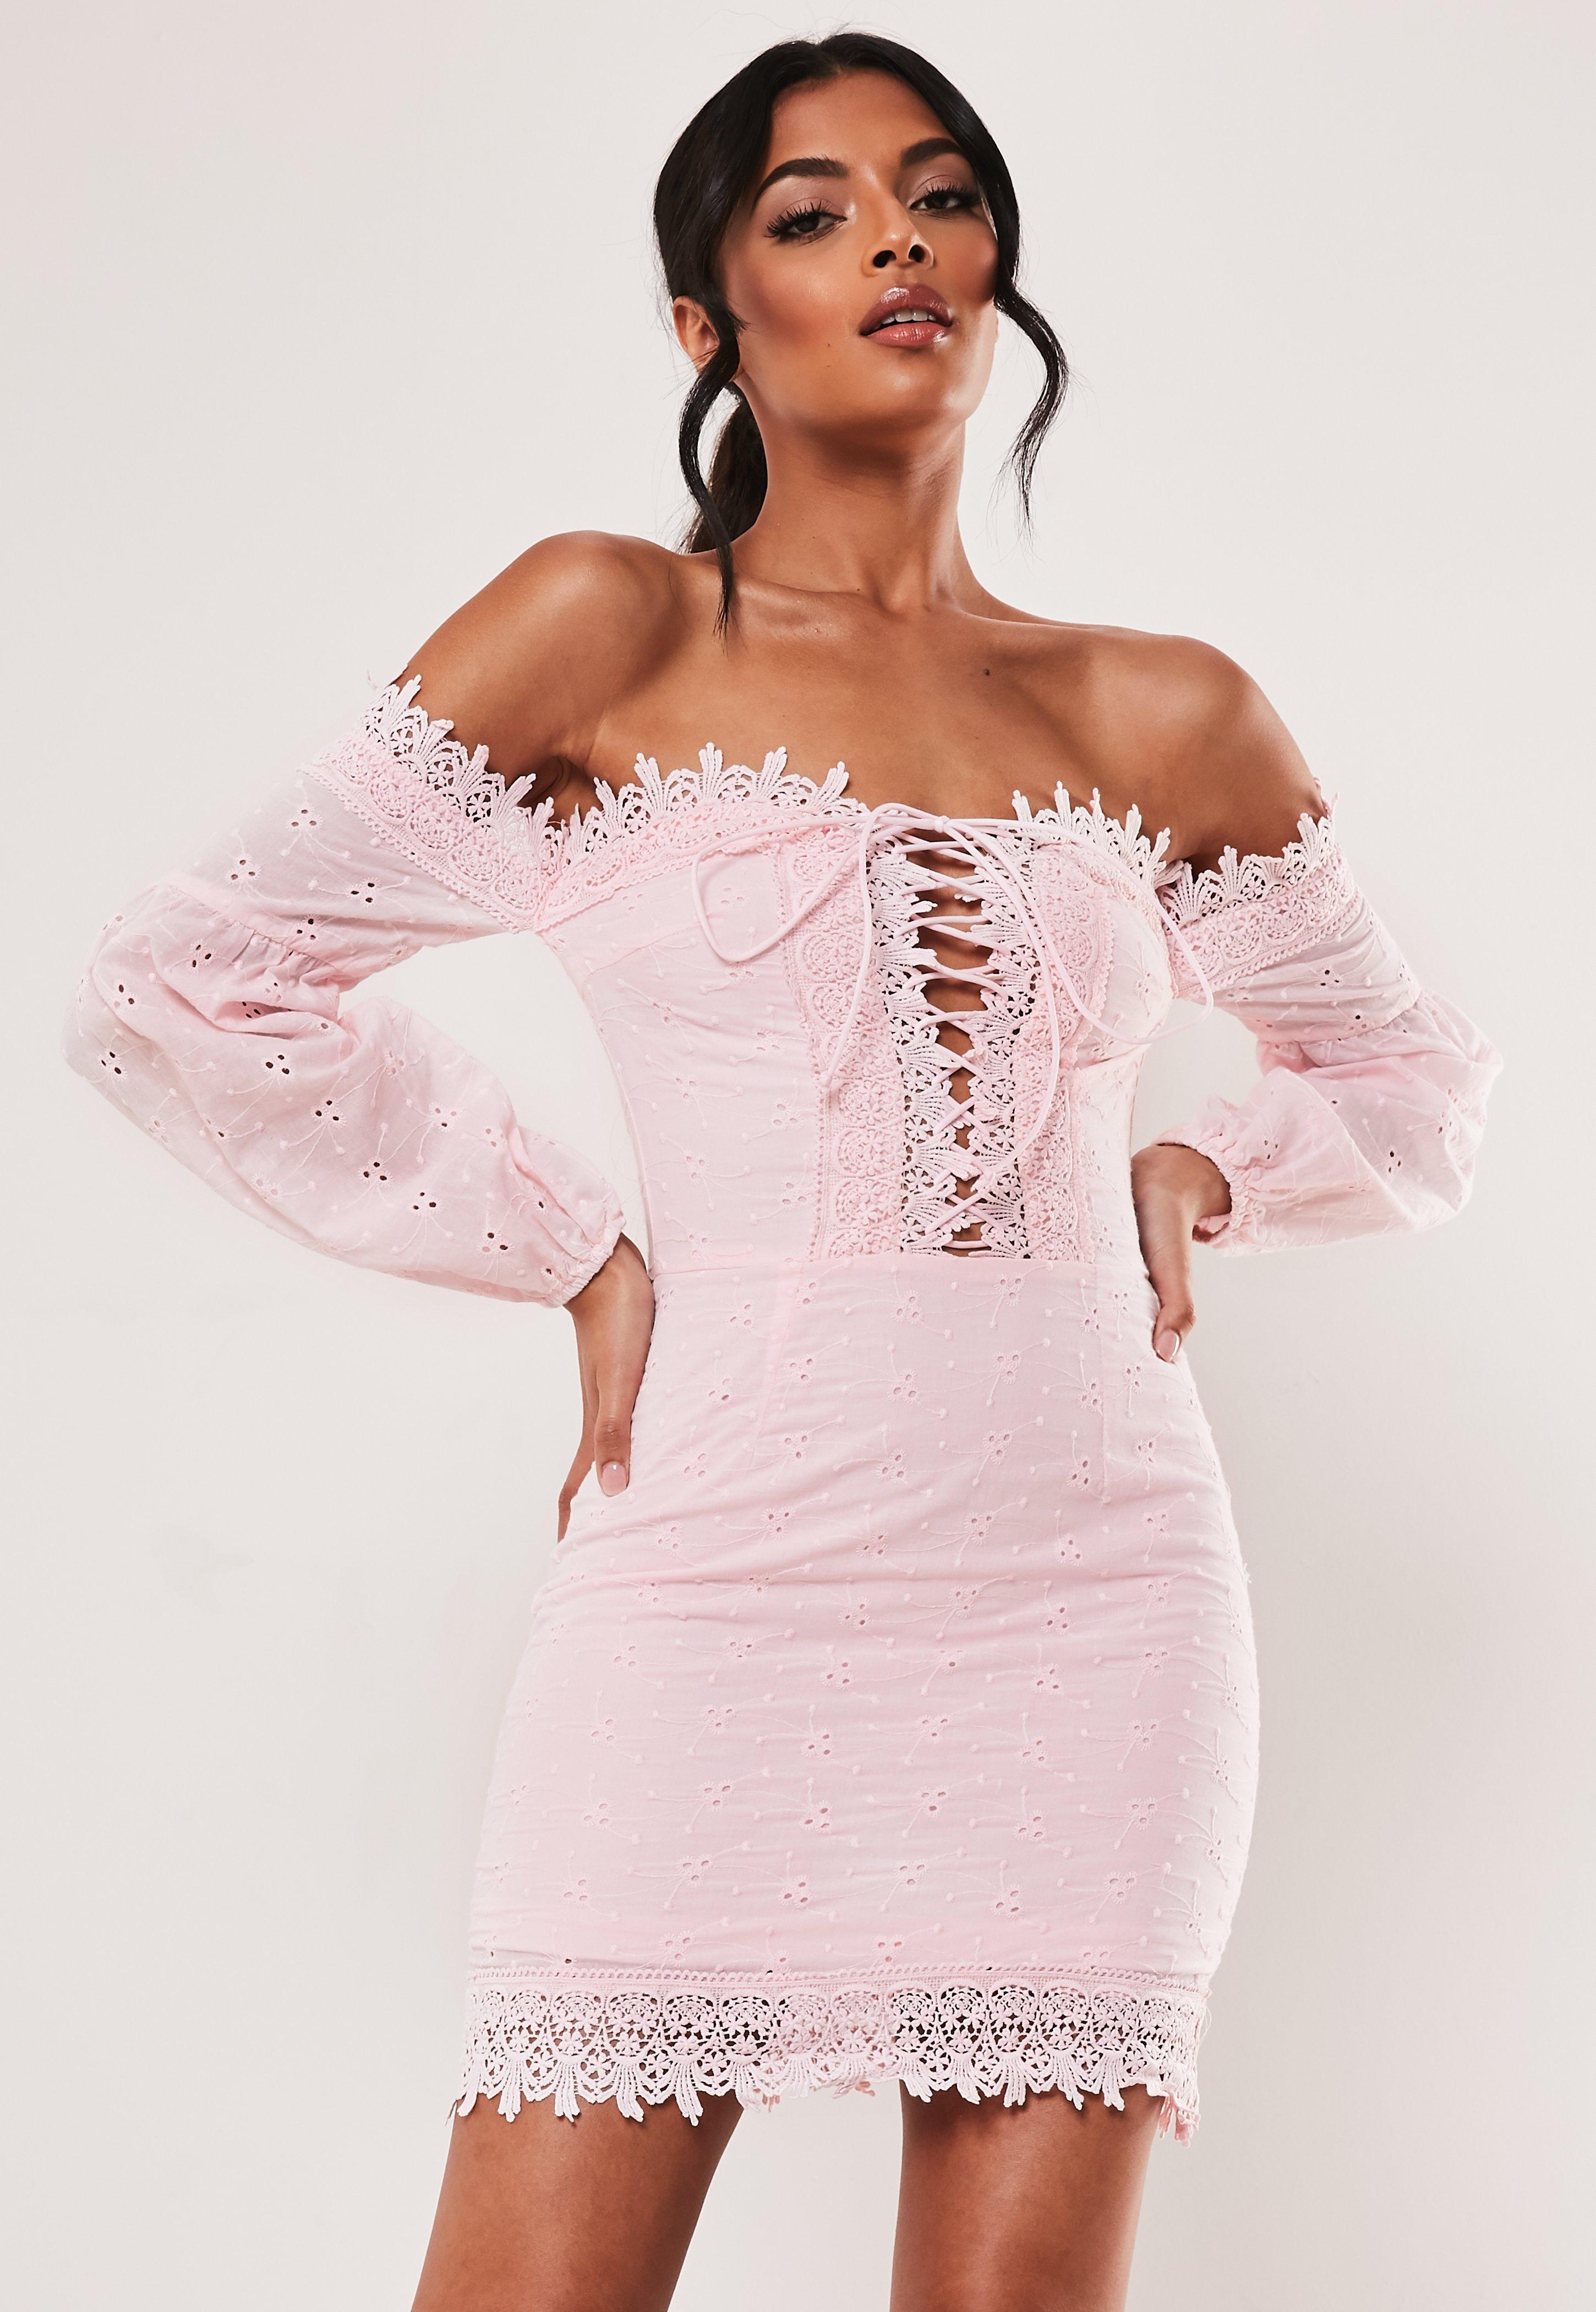 f7ad3df4d09d Bardot Dresses | Off The Shoulder Dresses - Missguided